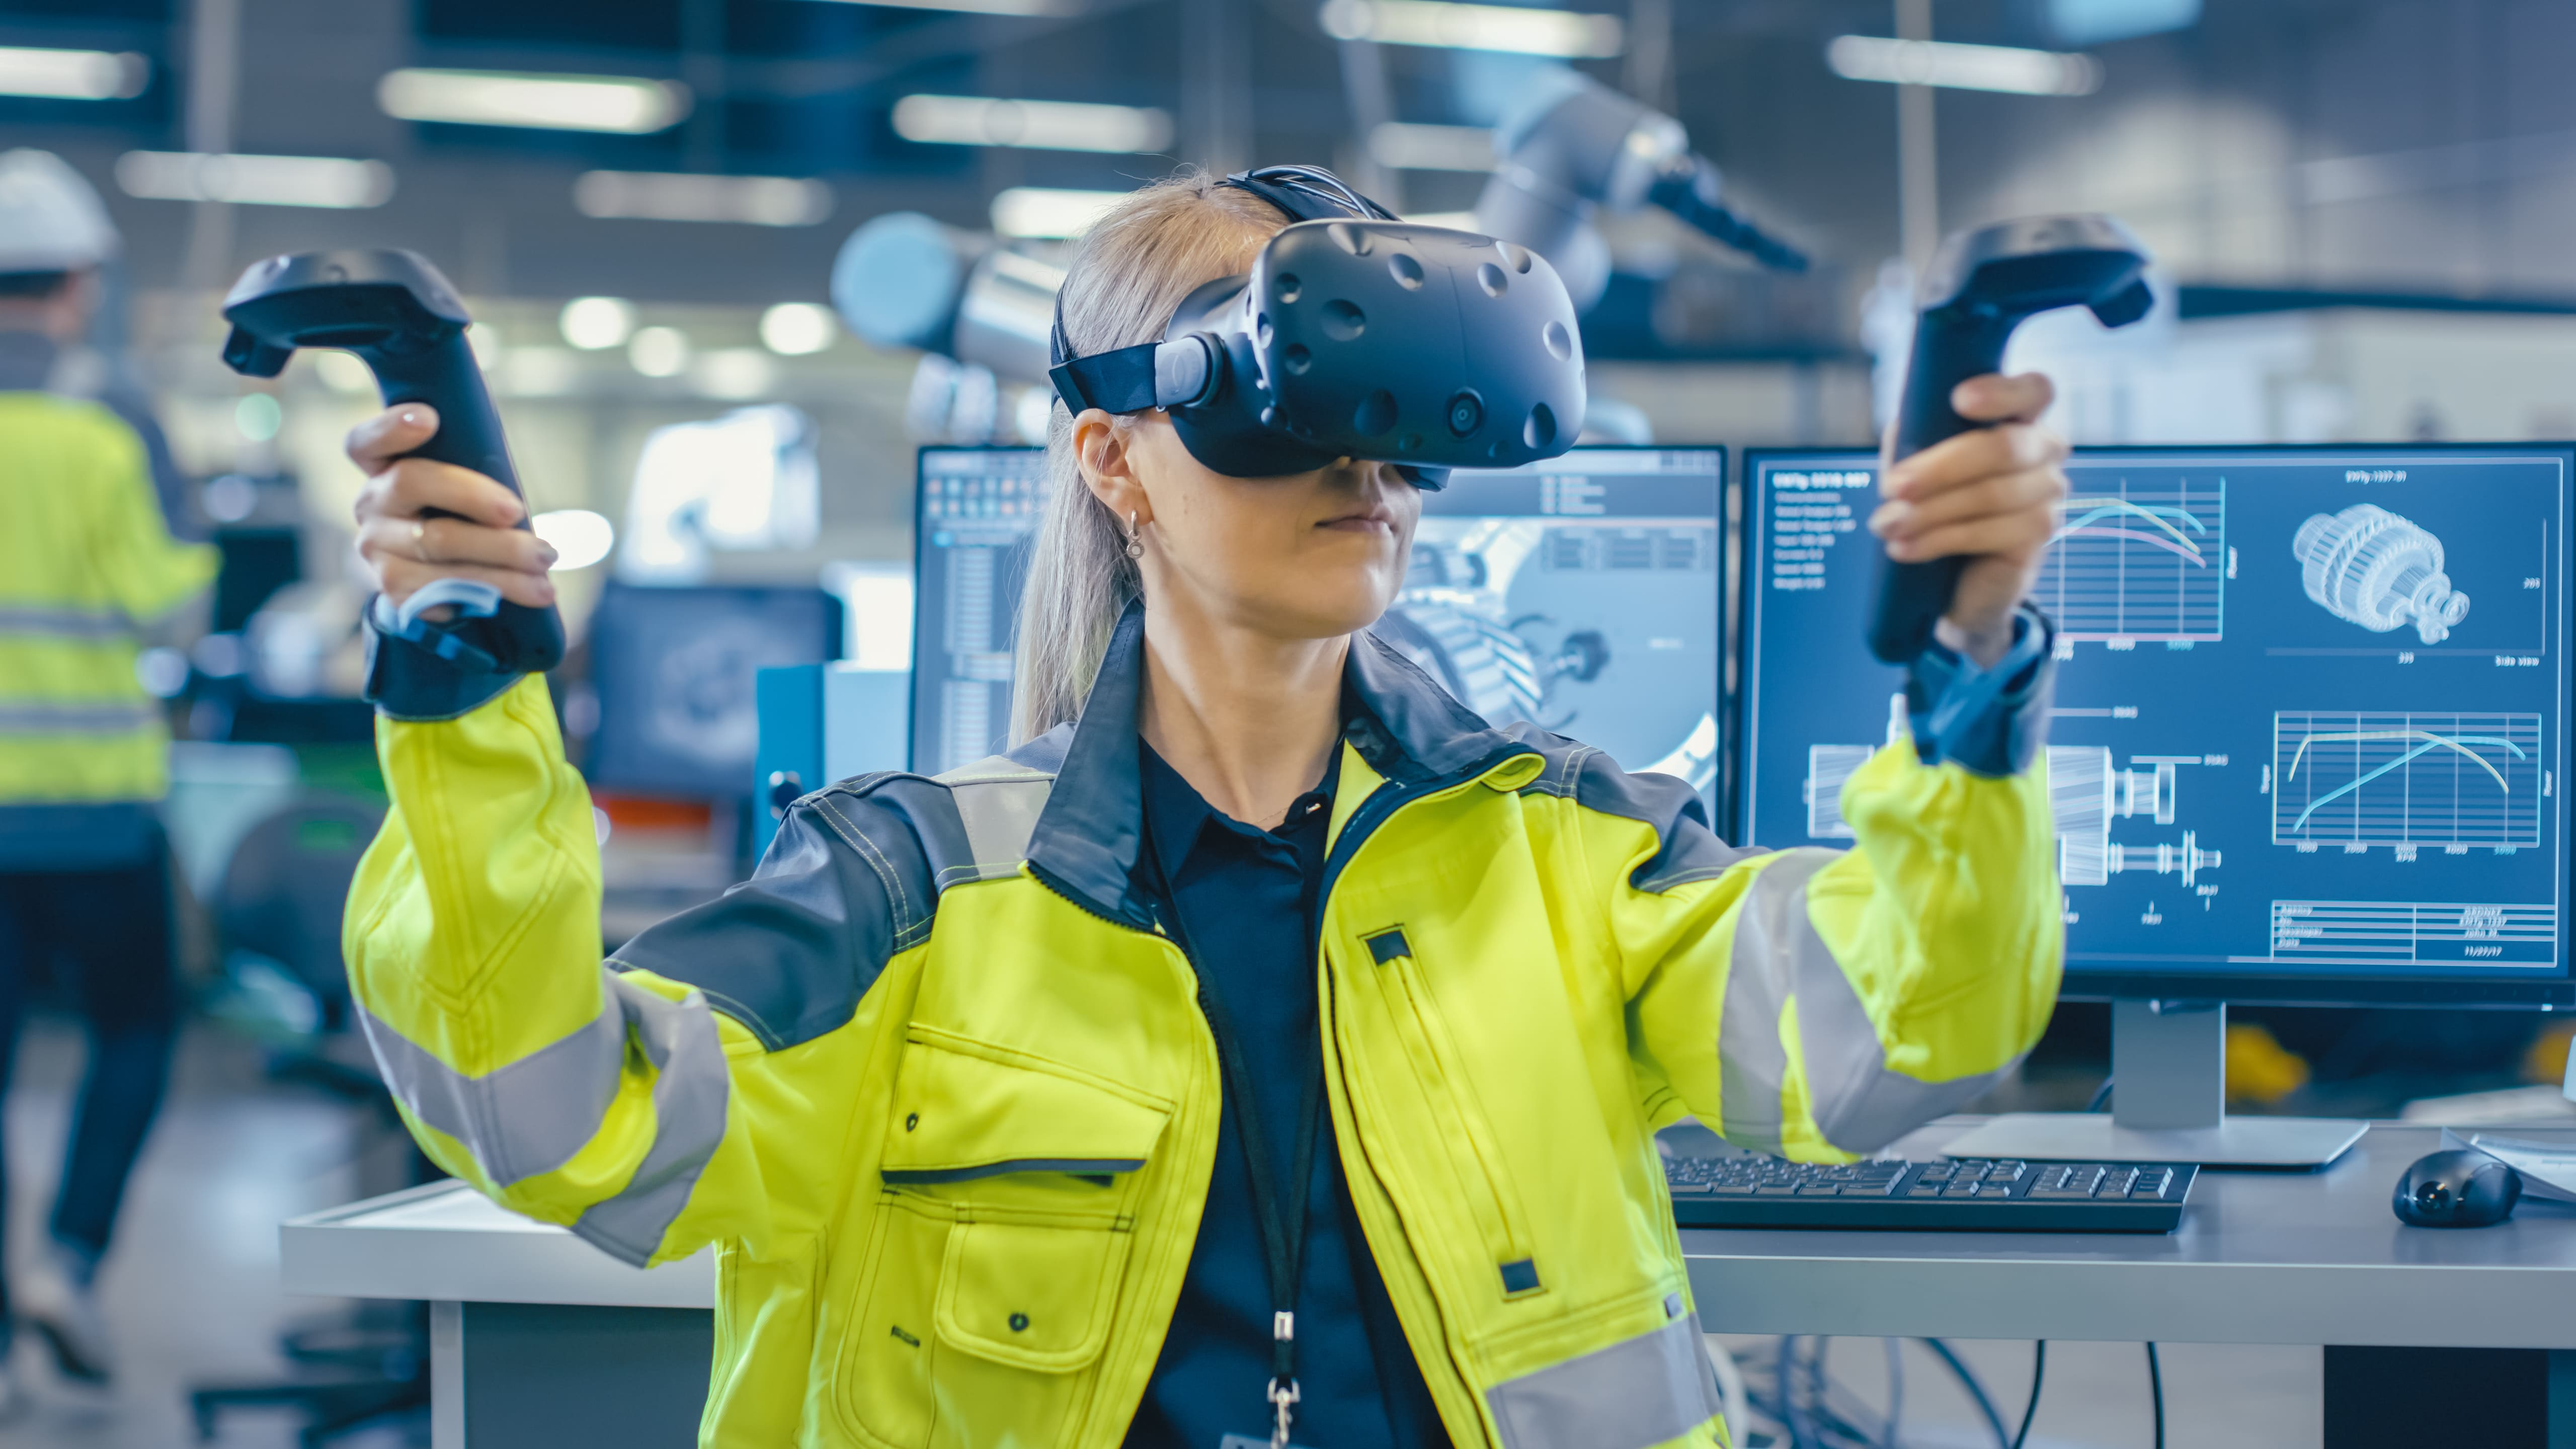 augmented reality digital transformation technologies